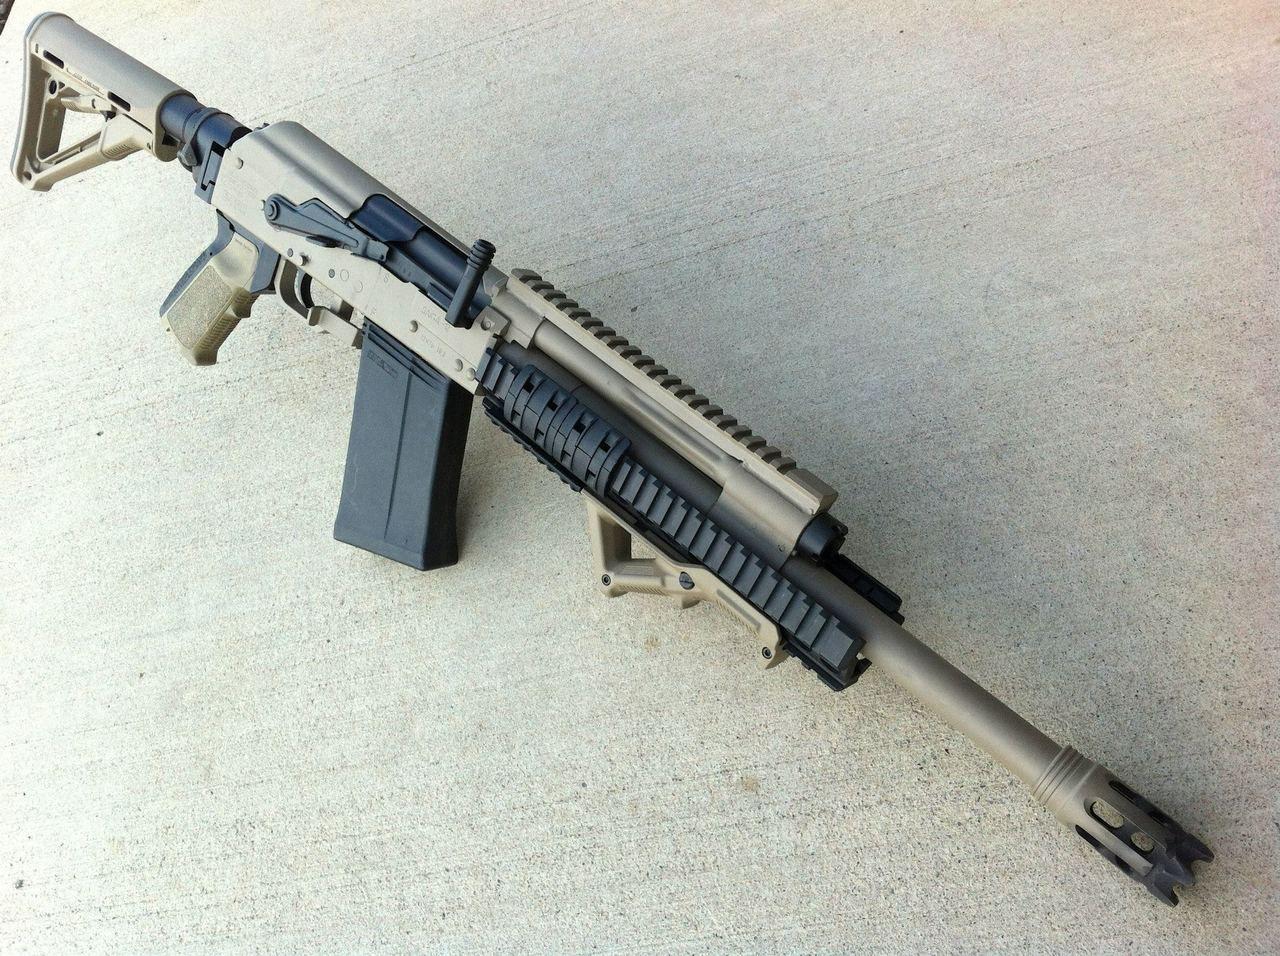 Saiga-12. The hunting gun Saiga-12. Caliber, characteristics, photo